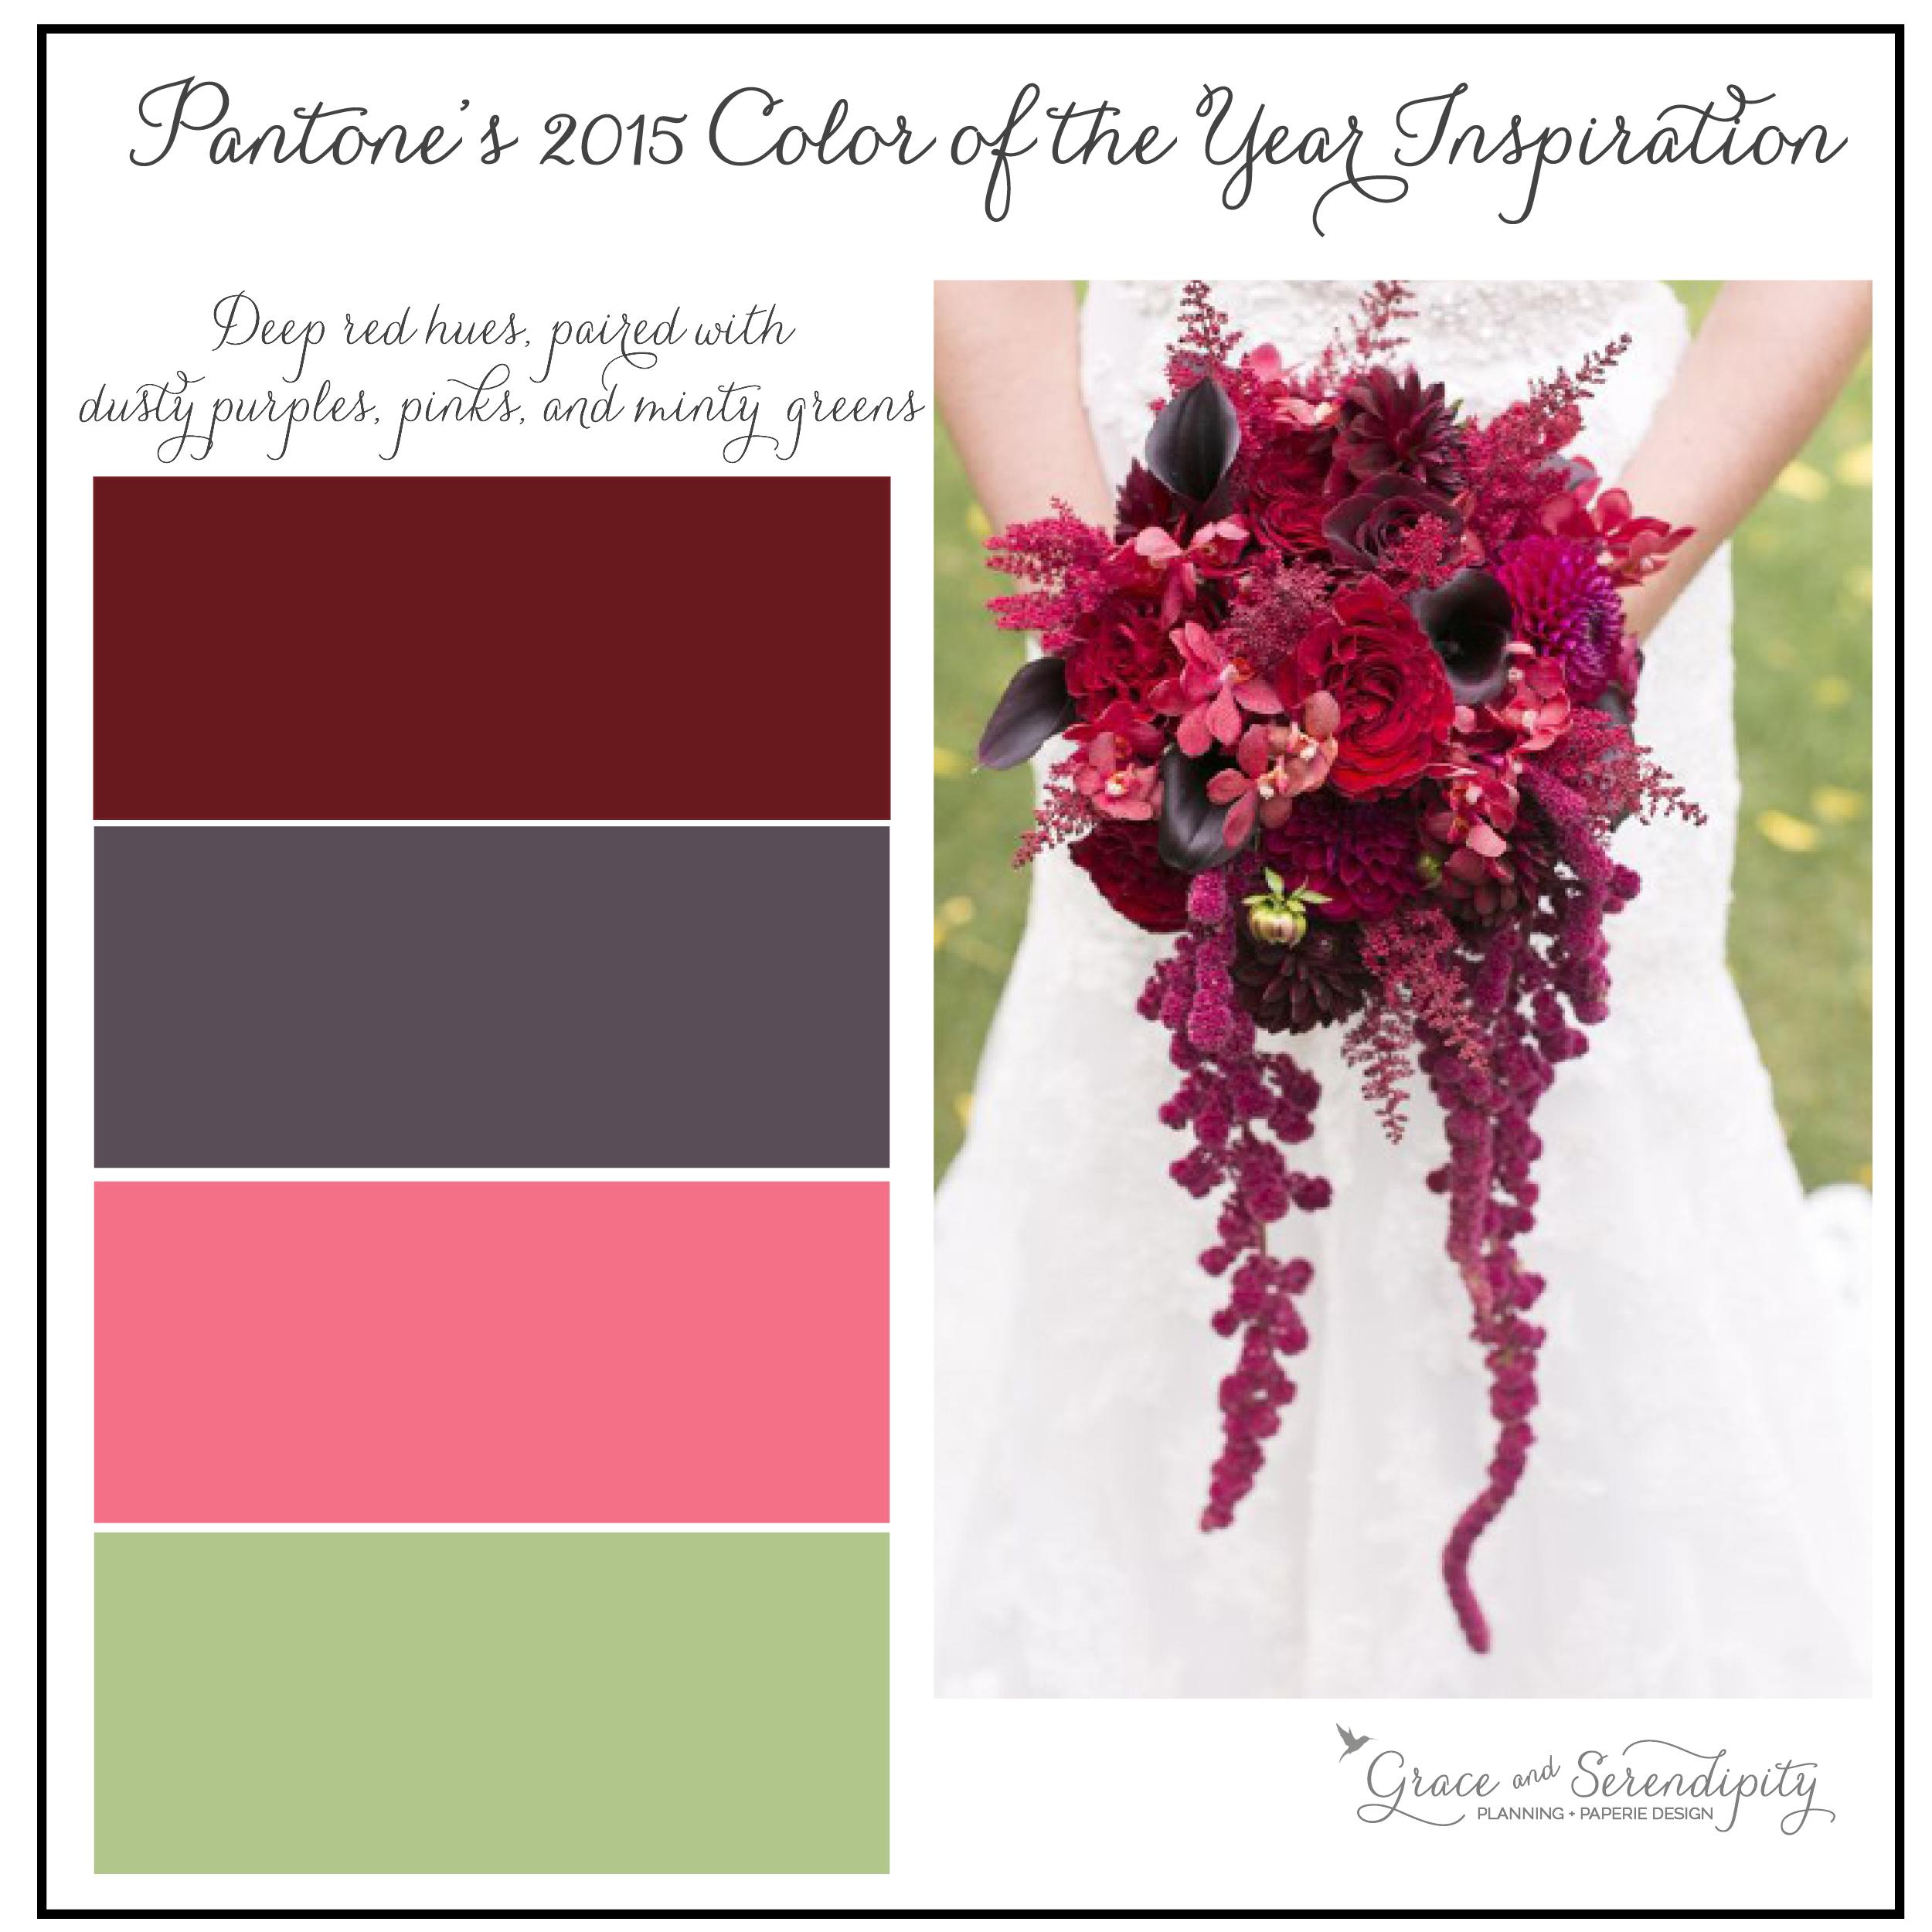 grace and serendipity - marsala inspiration board - burgundy, purple, pink, green